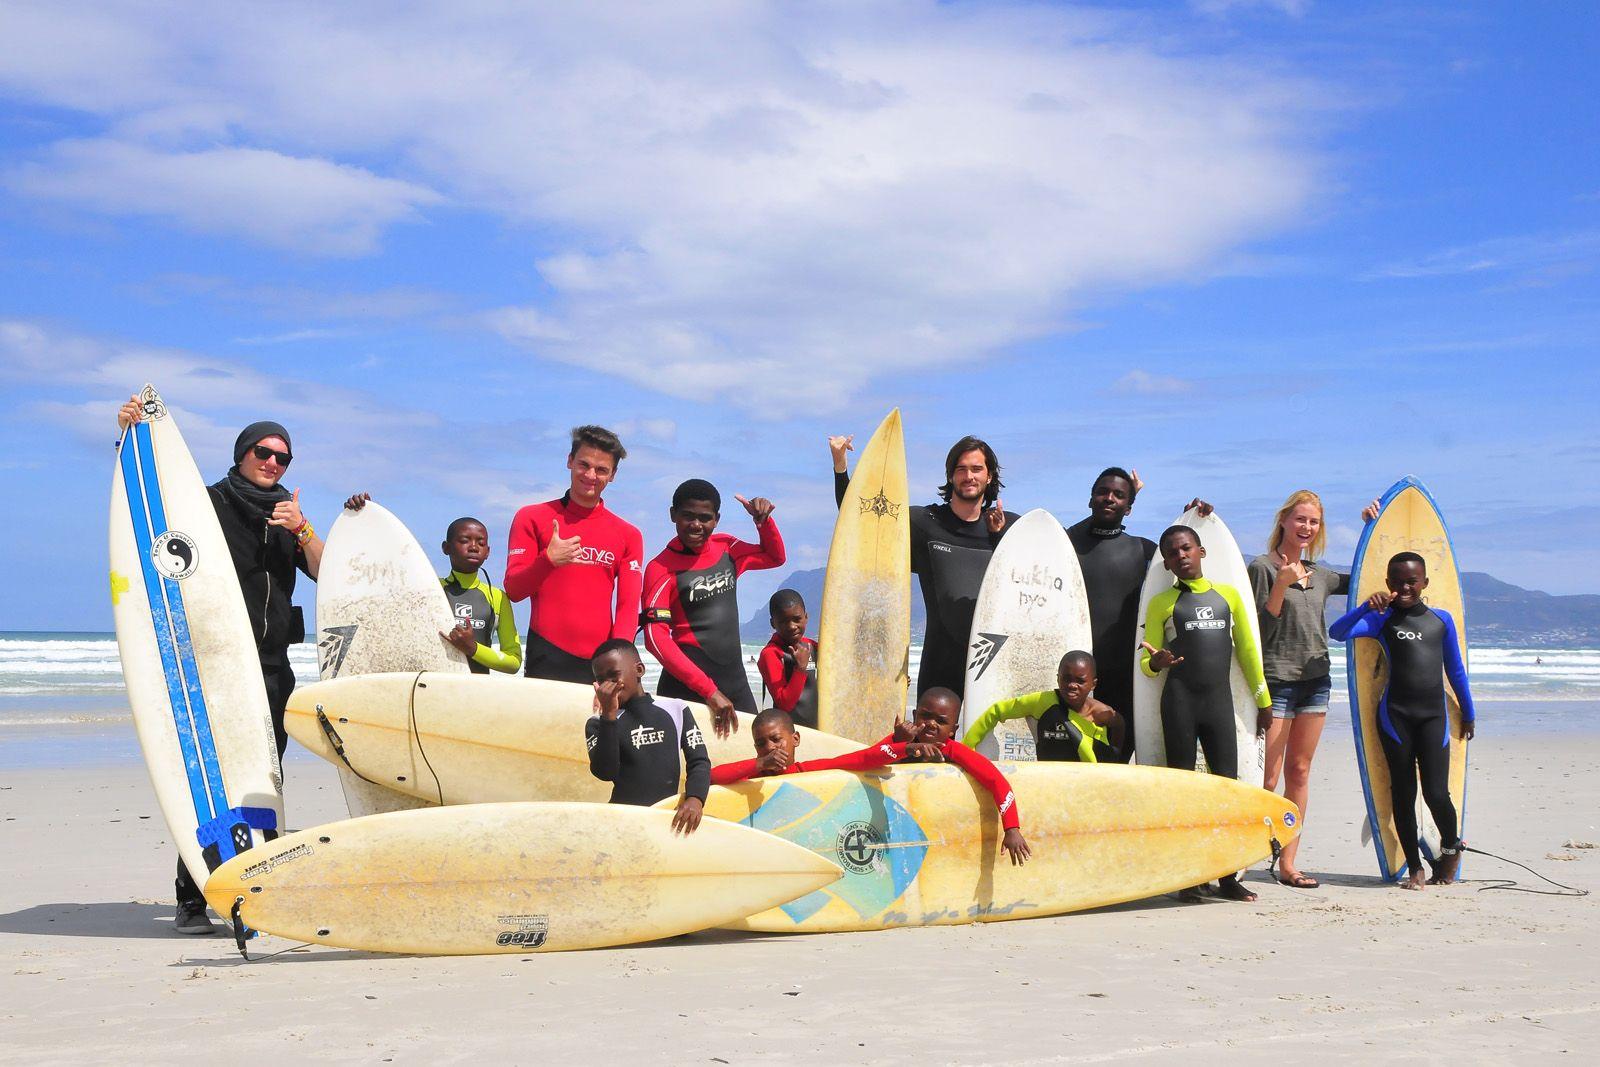 Surfing Smiles, volunteer project